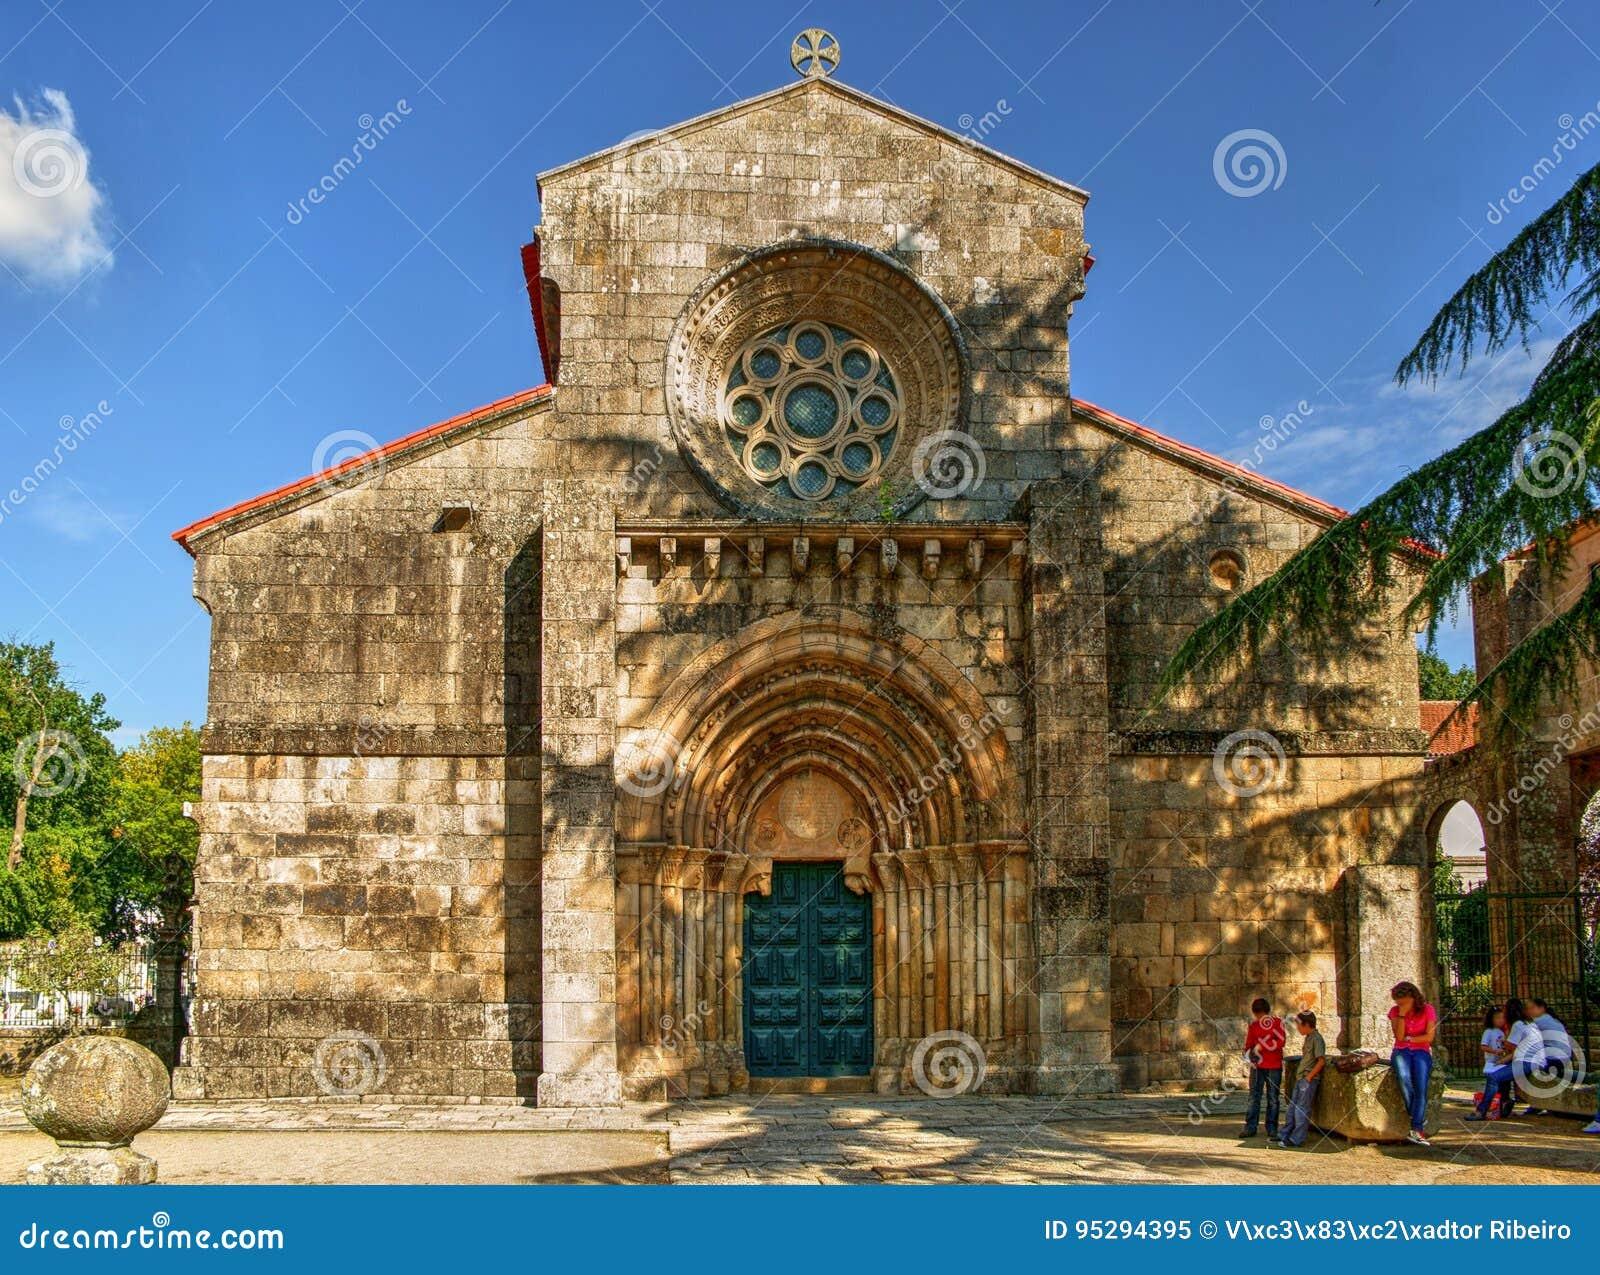 Mosteiro do Salvador de Paco de Sousa